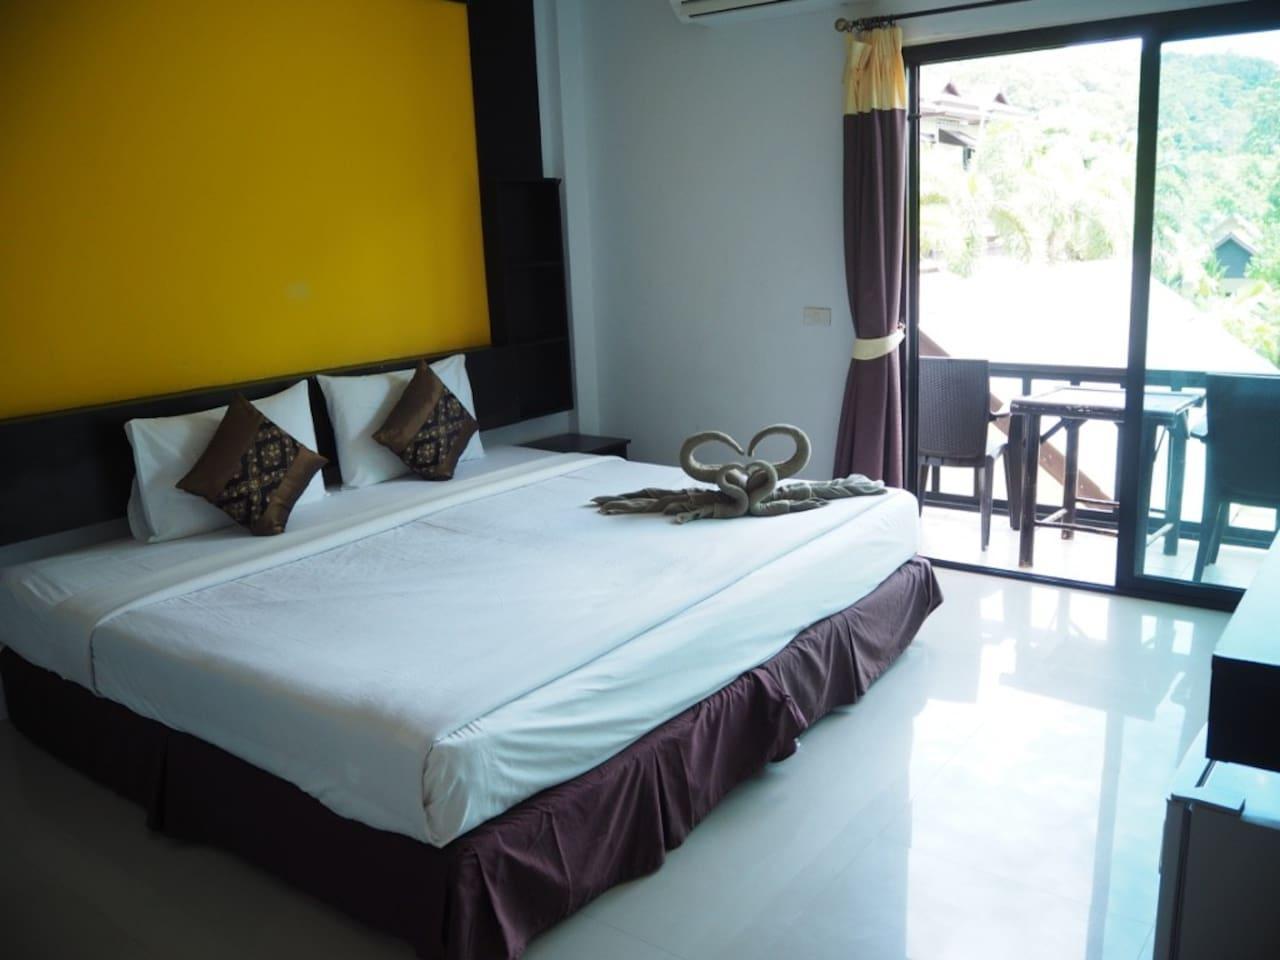 Cosy standard room near beach on Phi Phi วิลลา 1 ห้องนอน 1 ห้องน้ำส่วนตัว ขนาด 100 ตร.ม. – อ่าวต้นไทร